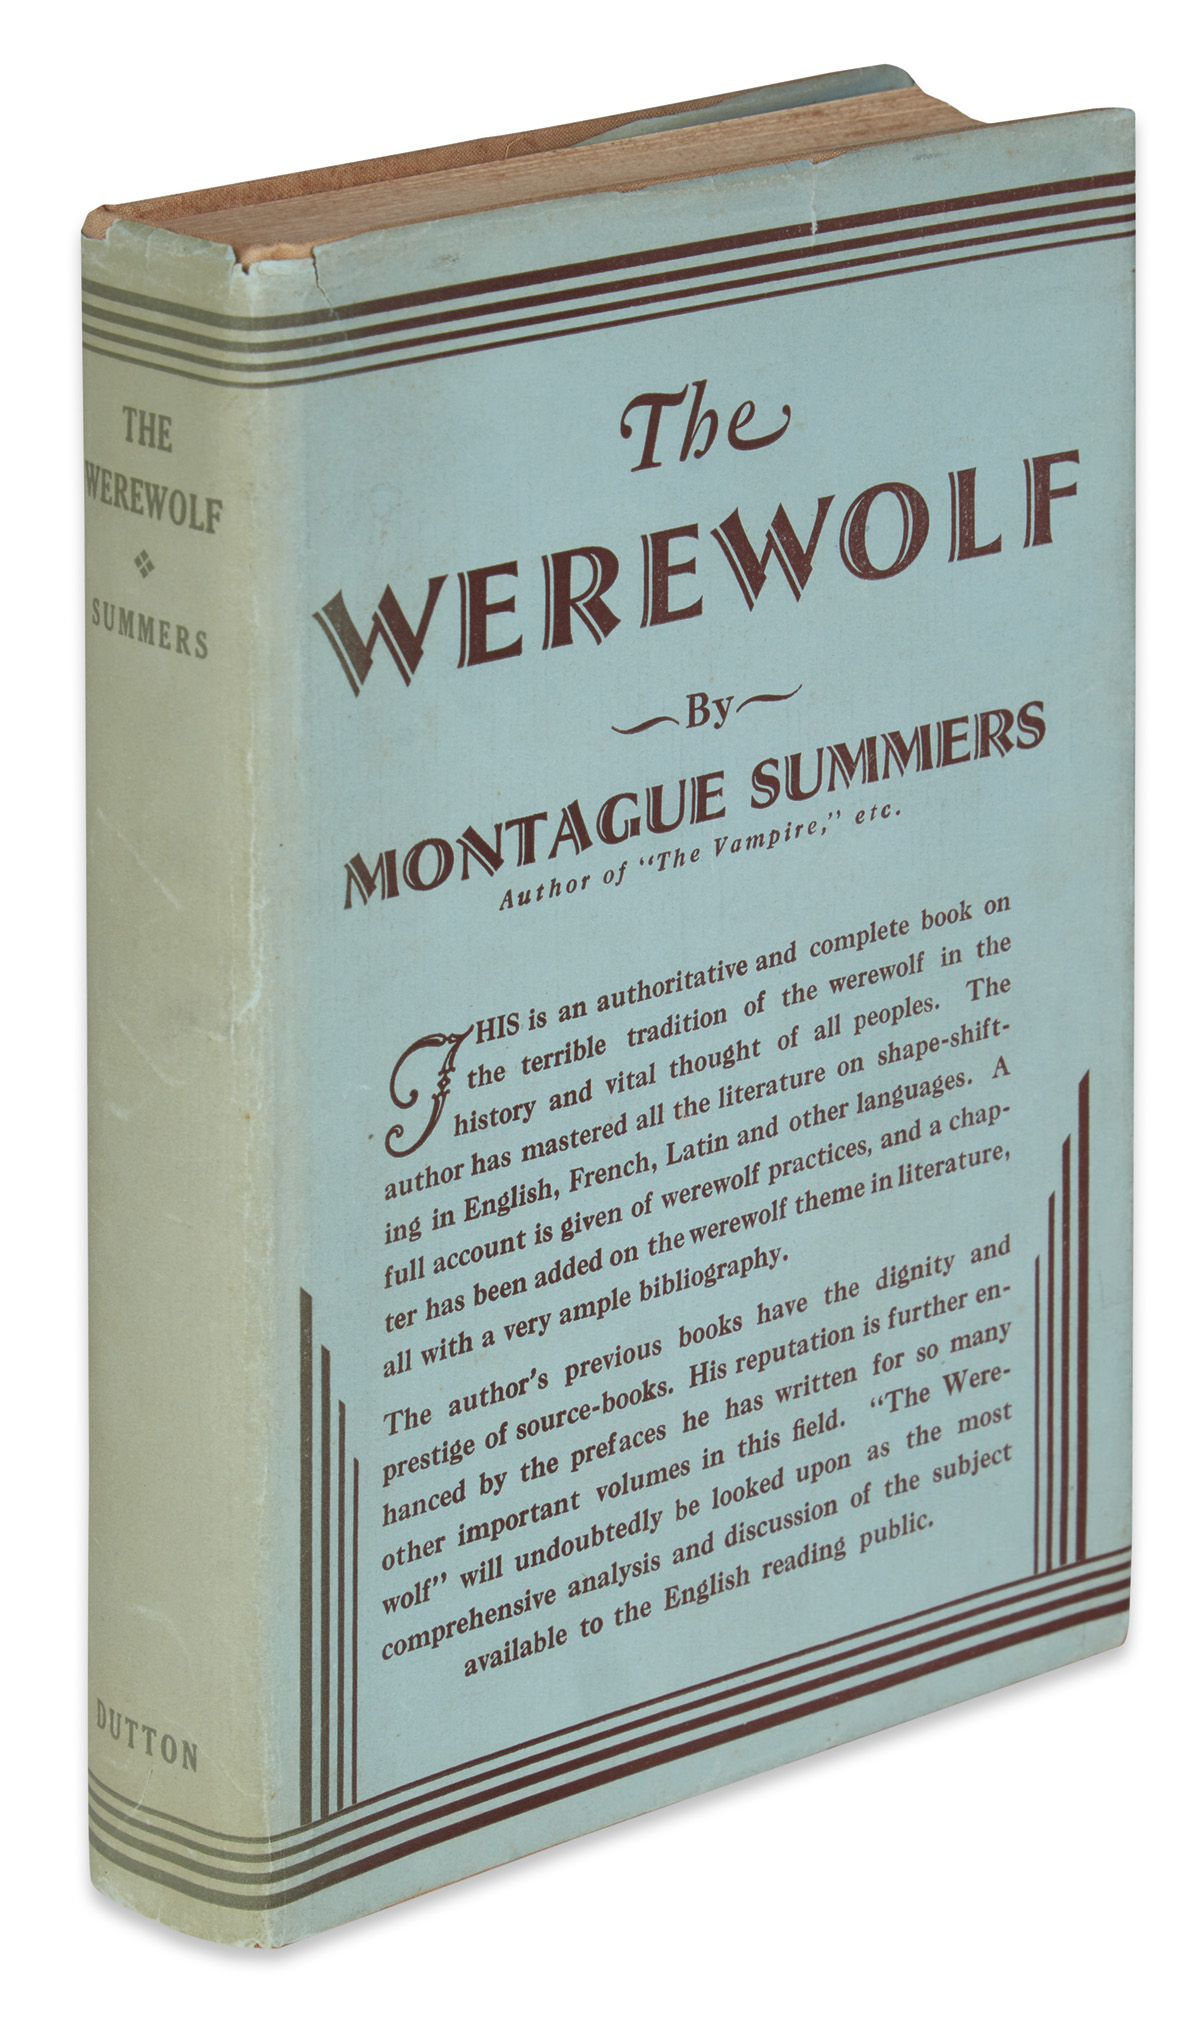 SUMMERS-MONTAGUE-The-Werewolf